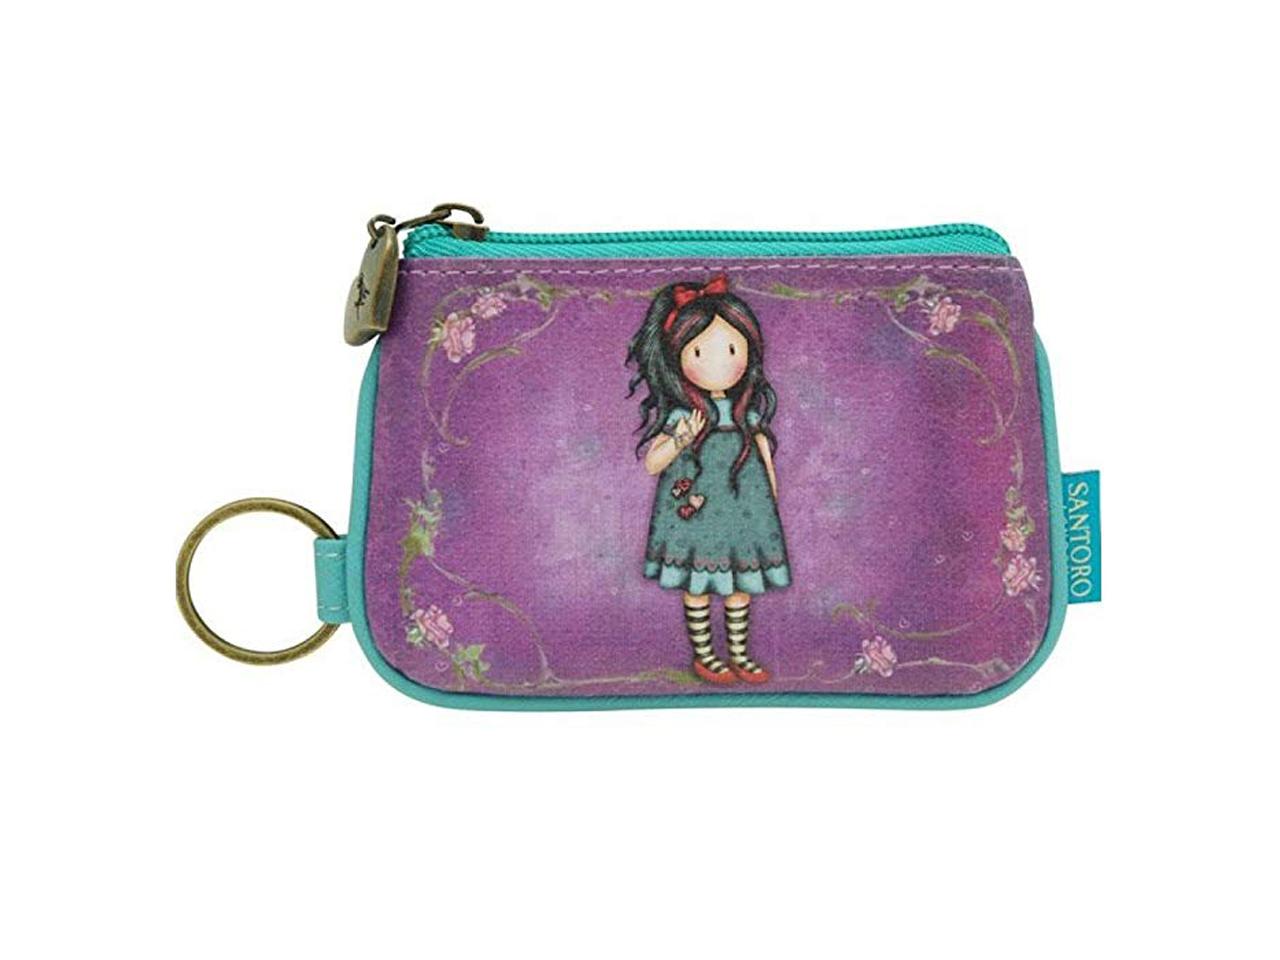 Santoro Gorjuss Keychain Zip Purse Wallet Cosmetics Case Accessory Case Pulling On Your Heartstrings